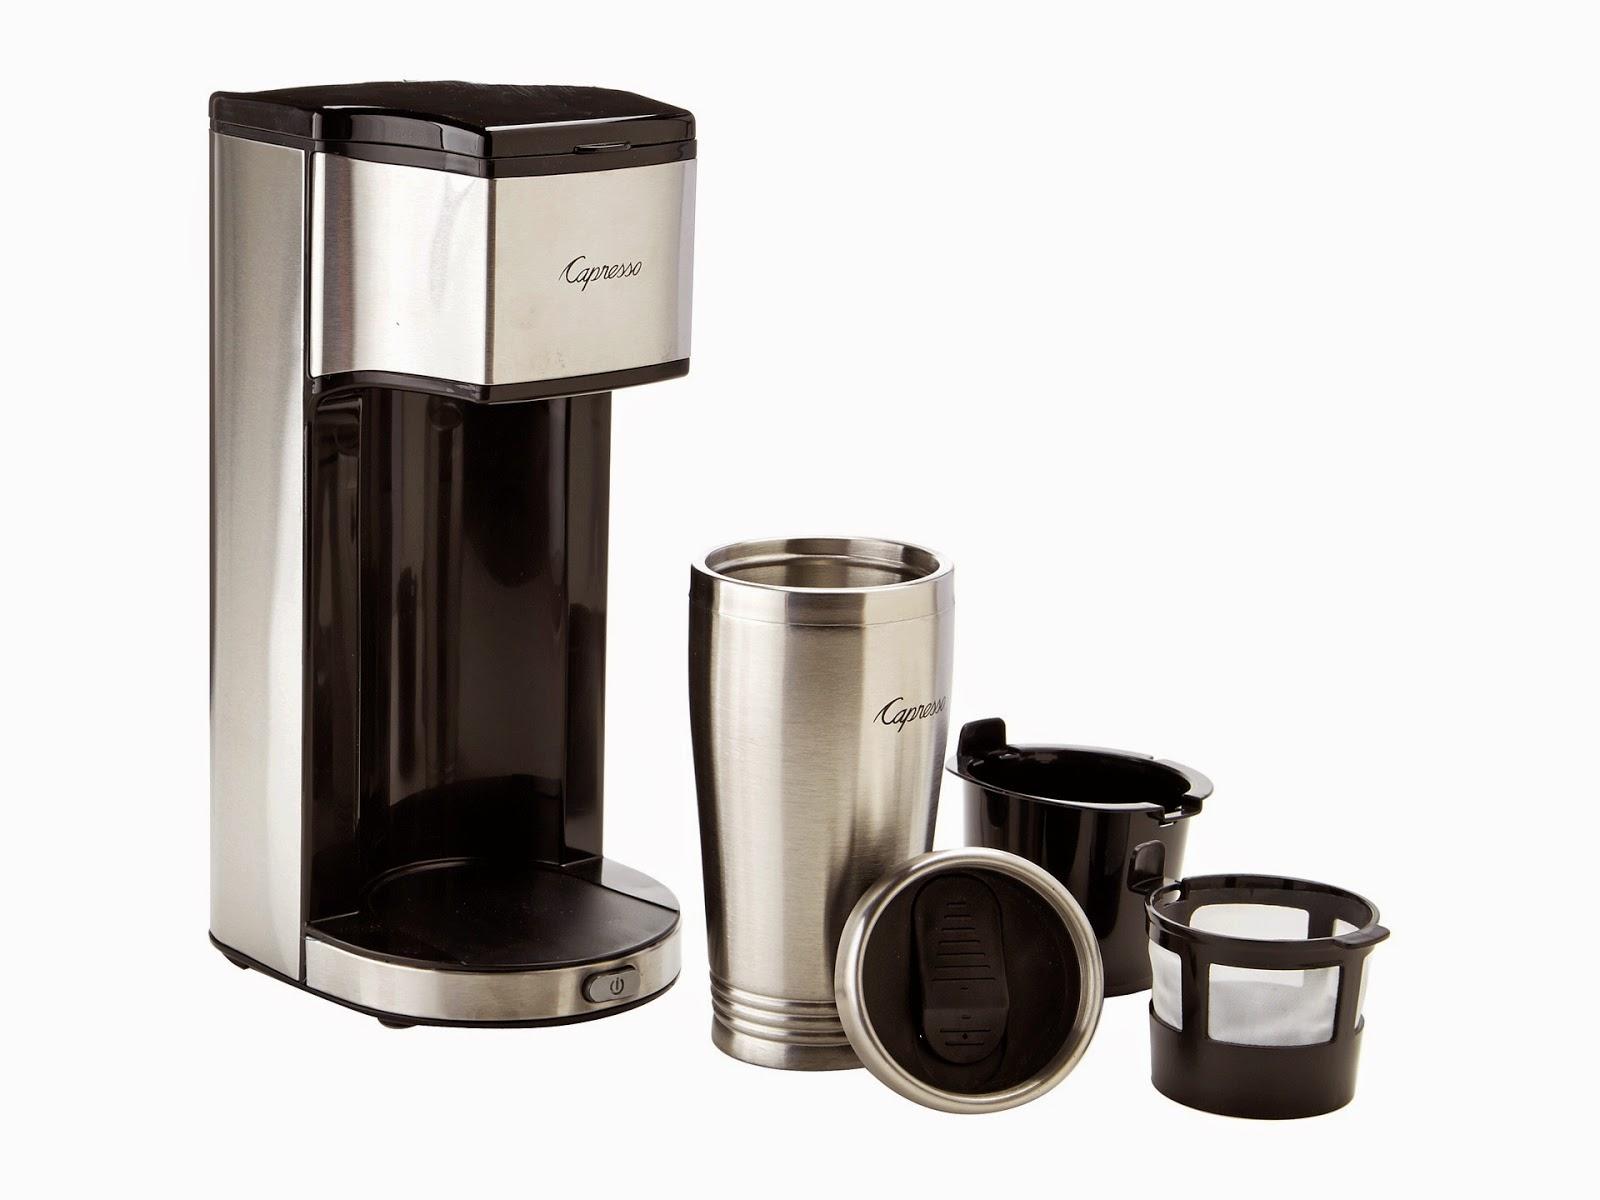 Capresso Coffee Maker Paper Filter : Top Notch Material: Capresso On-the-Go Personal Coffee Maker